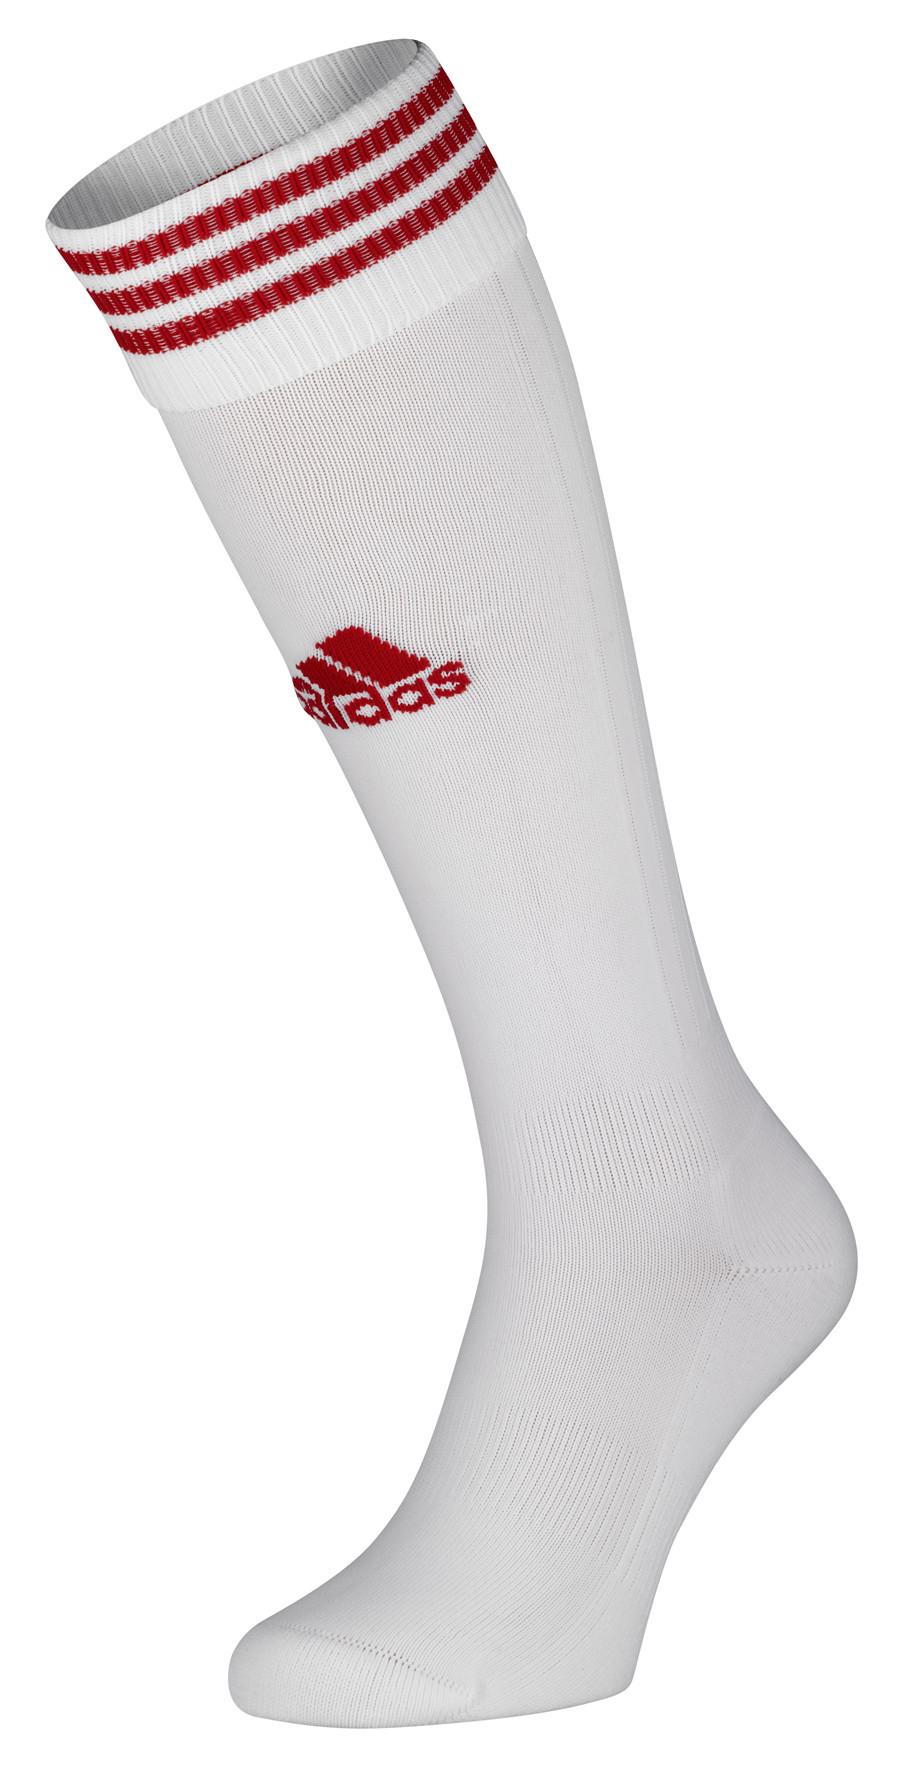 Adidas AdiSOCK White Red